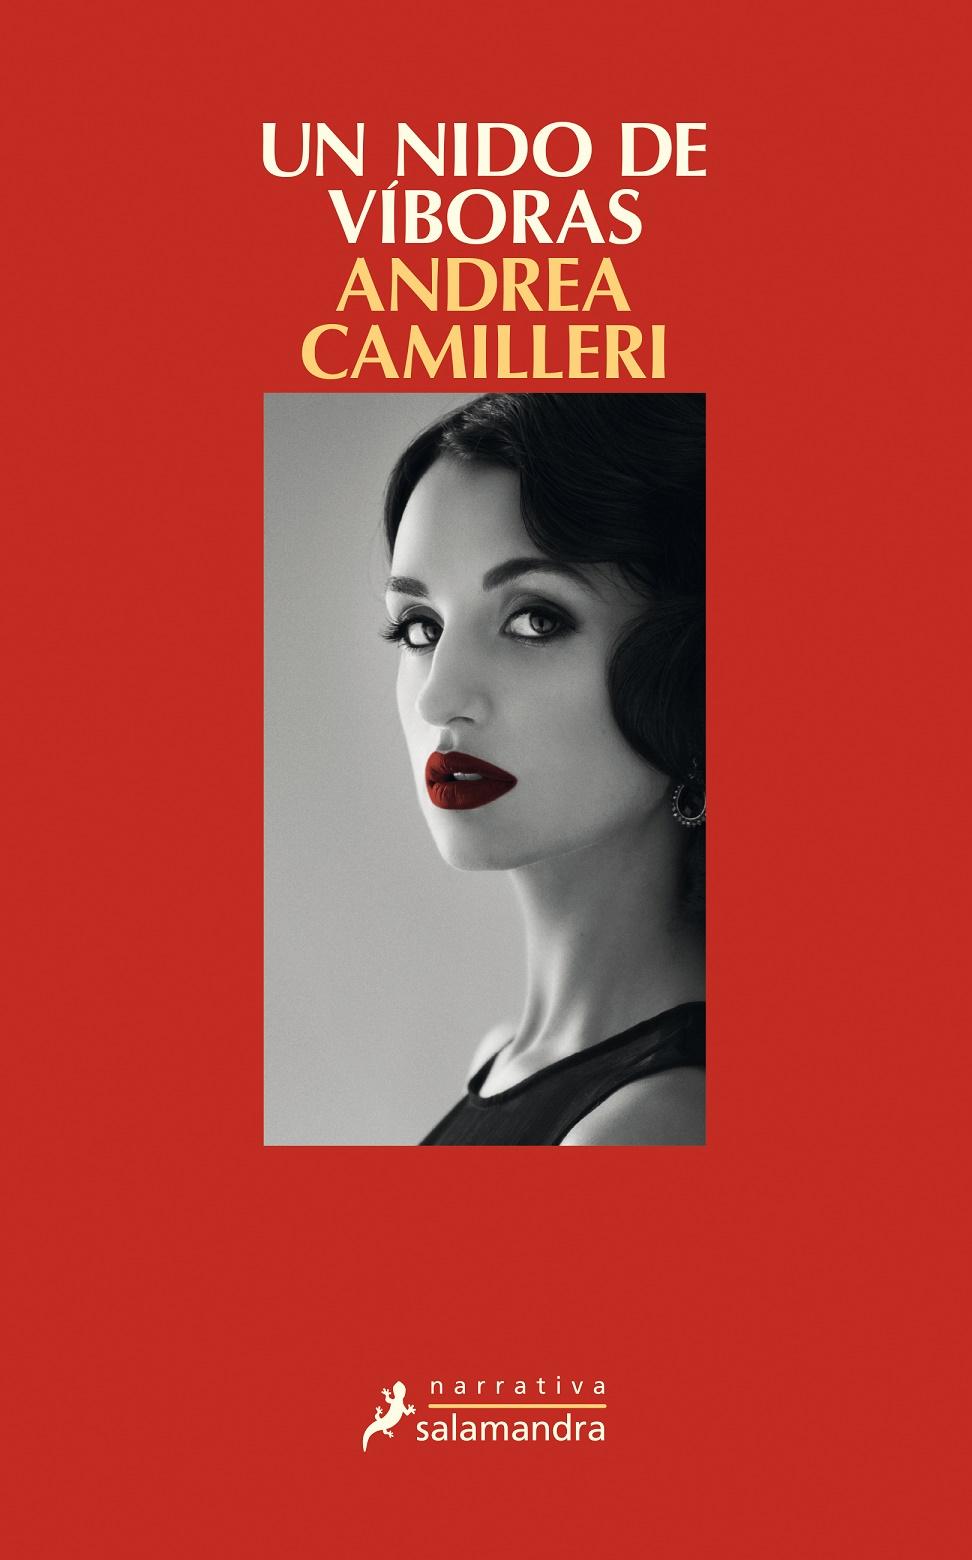 https://laantiguabiblos.blogspot.com.es/2017/04/un-nido-de-viboras-andrea-camilleri.html